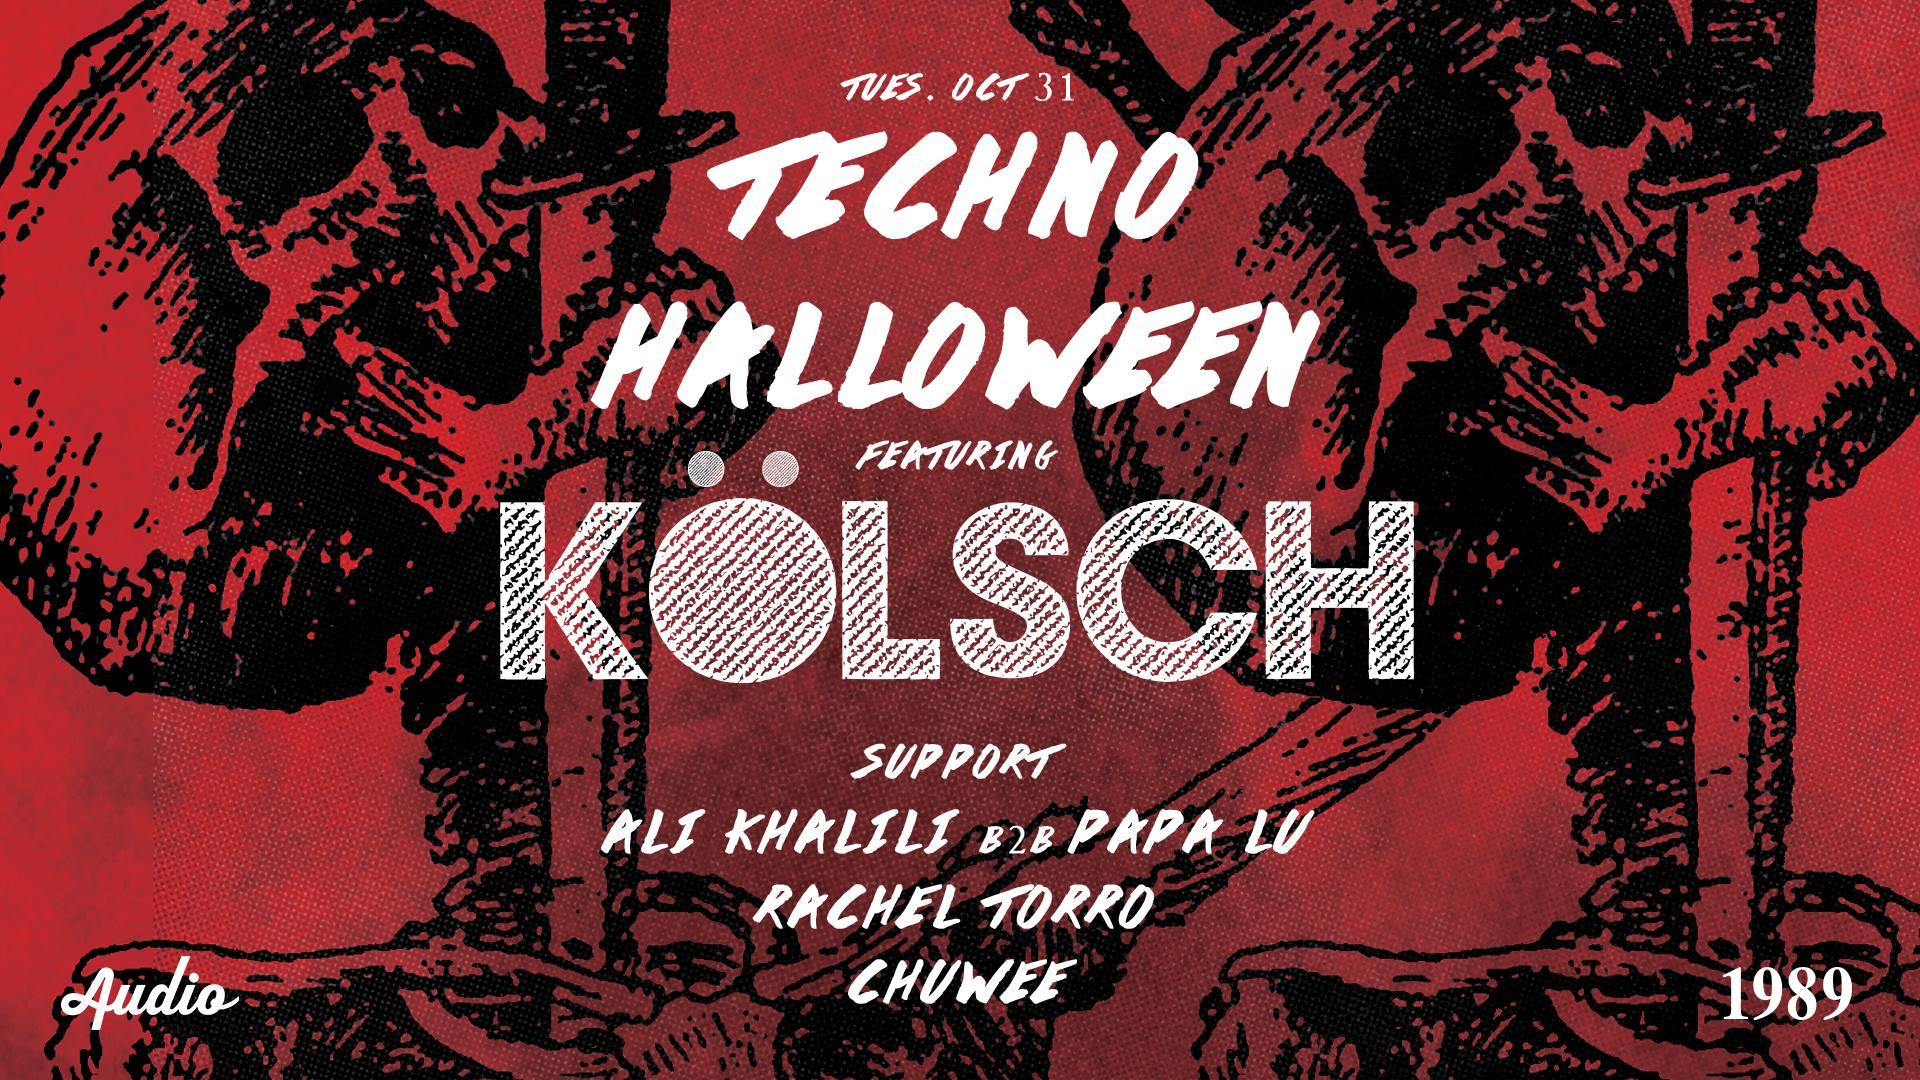 Techno Halloween w/ Kolsch